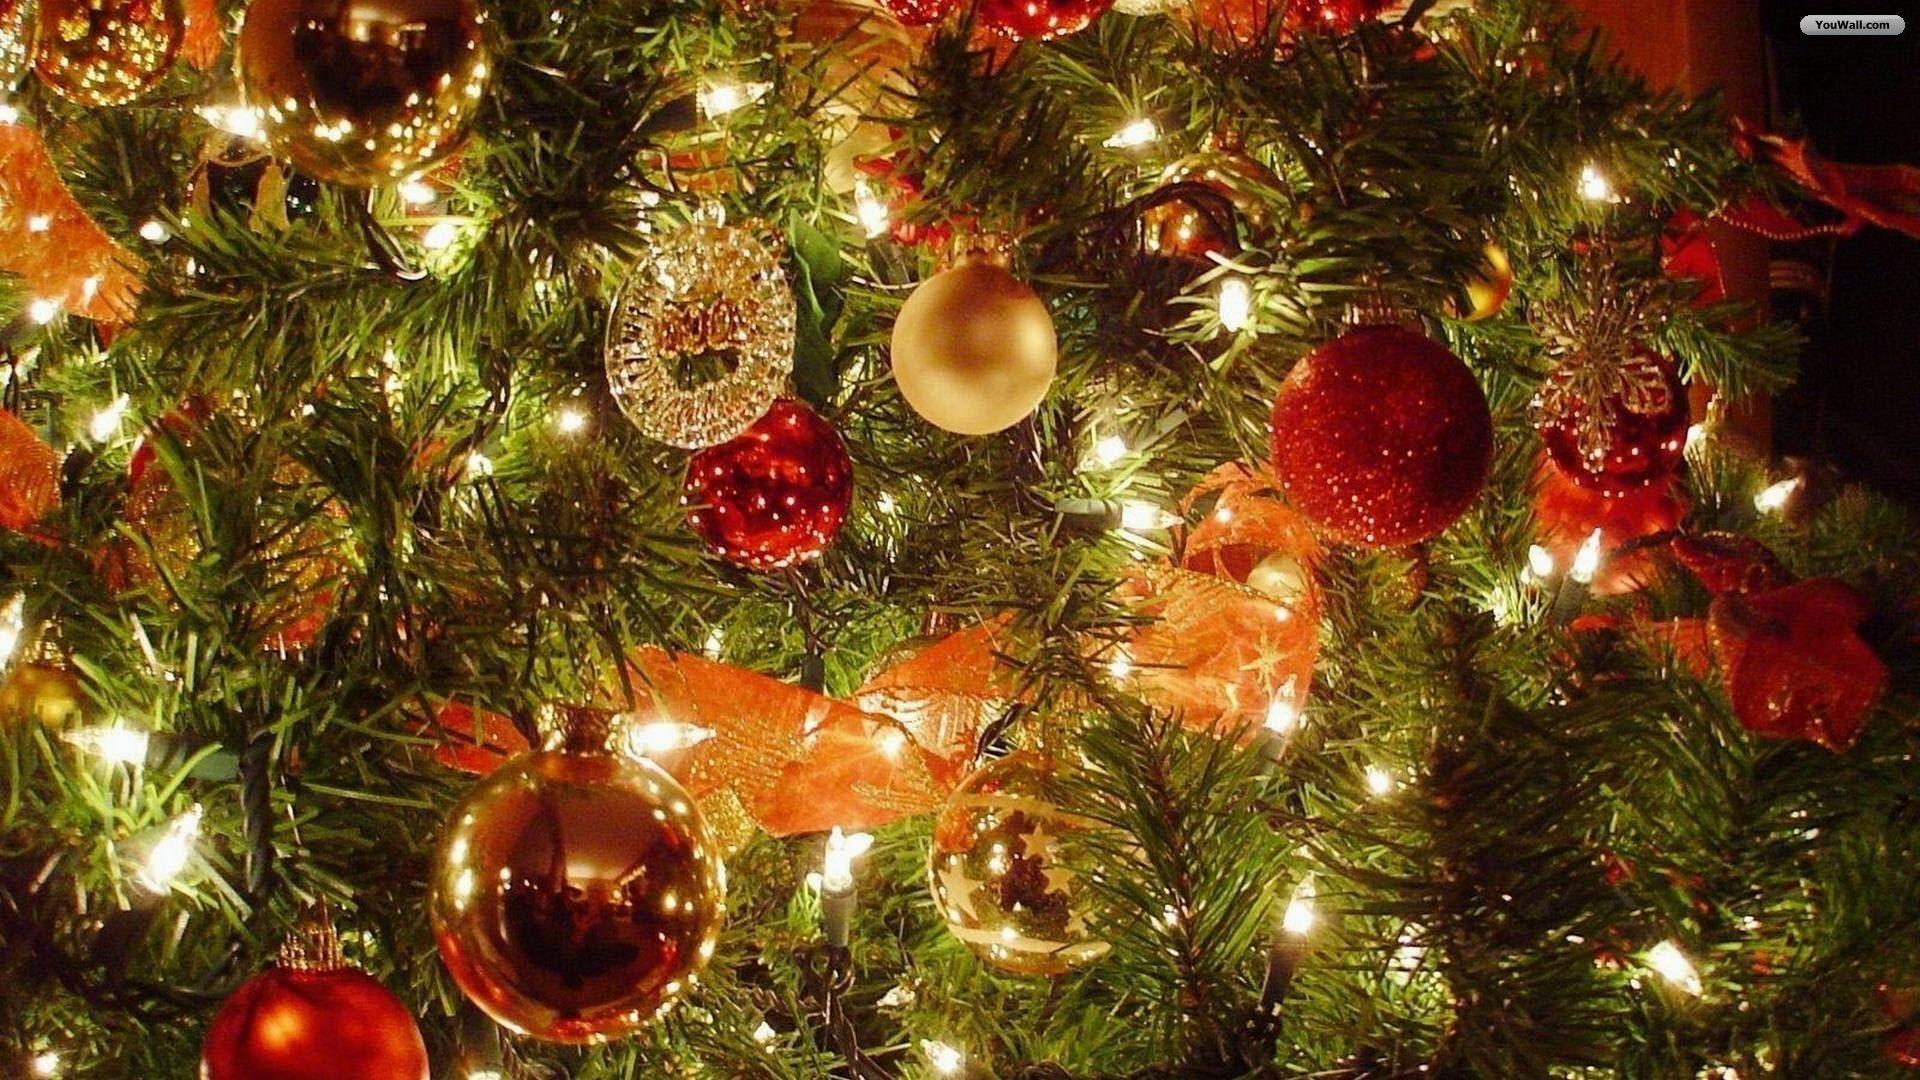 <b>Free Christmas Desktop Wallpaper</b>